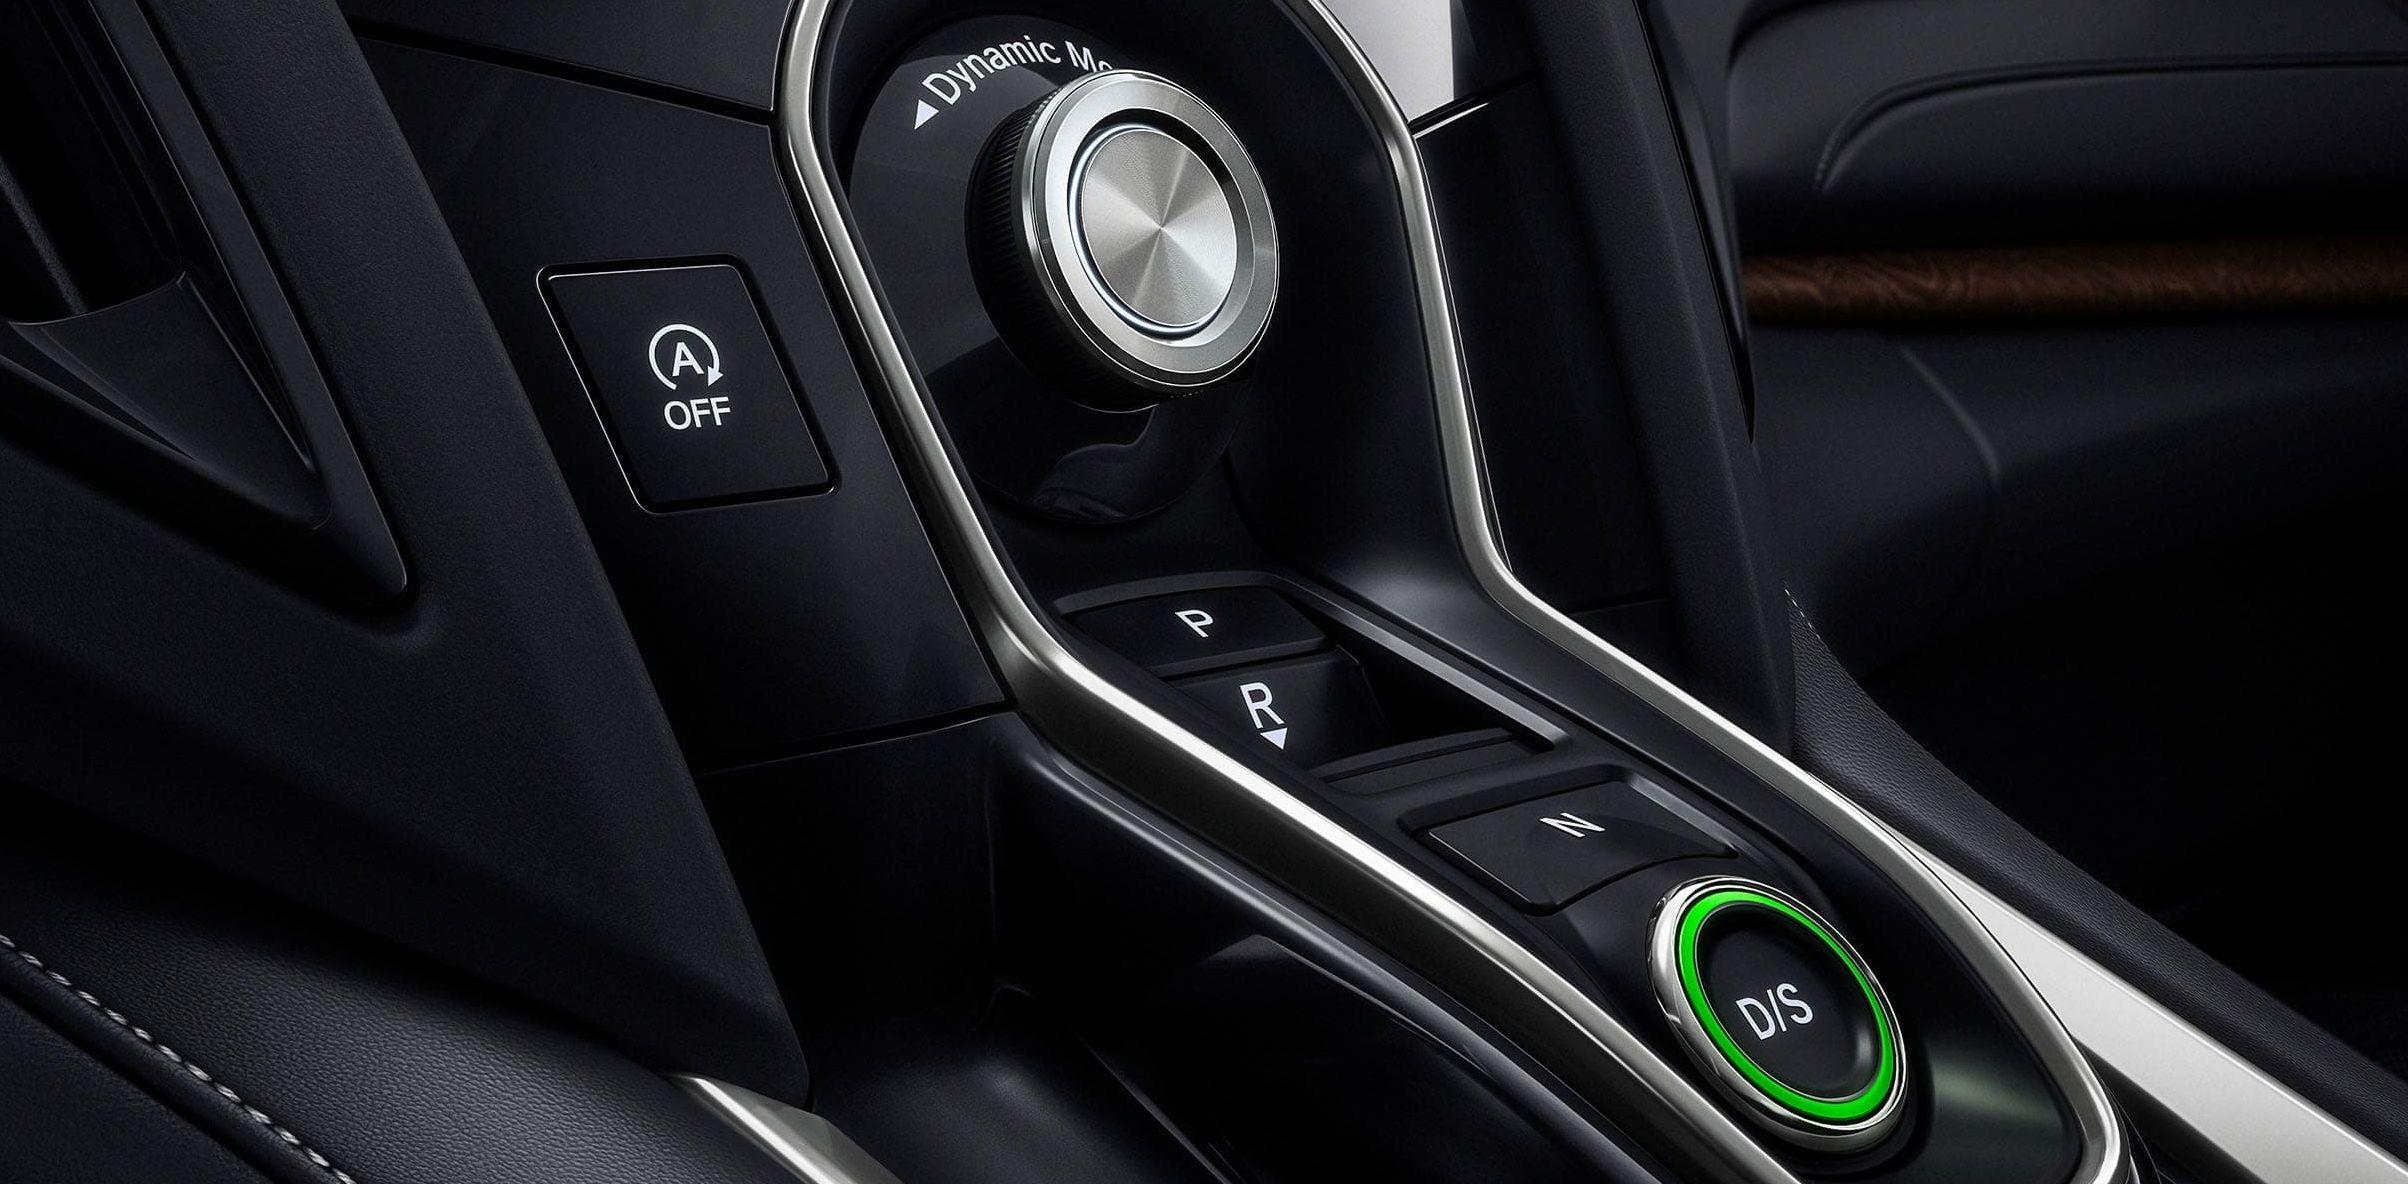 2020 Acura RDX Driving Technology